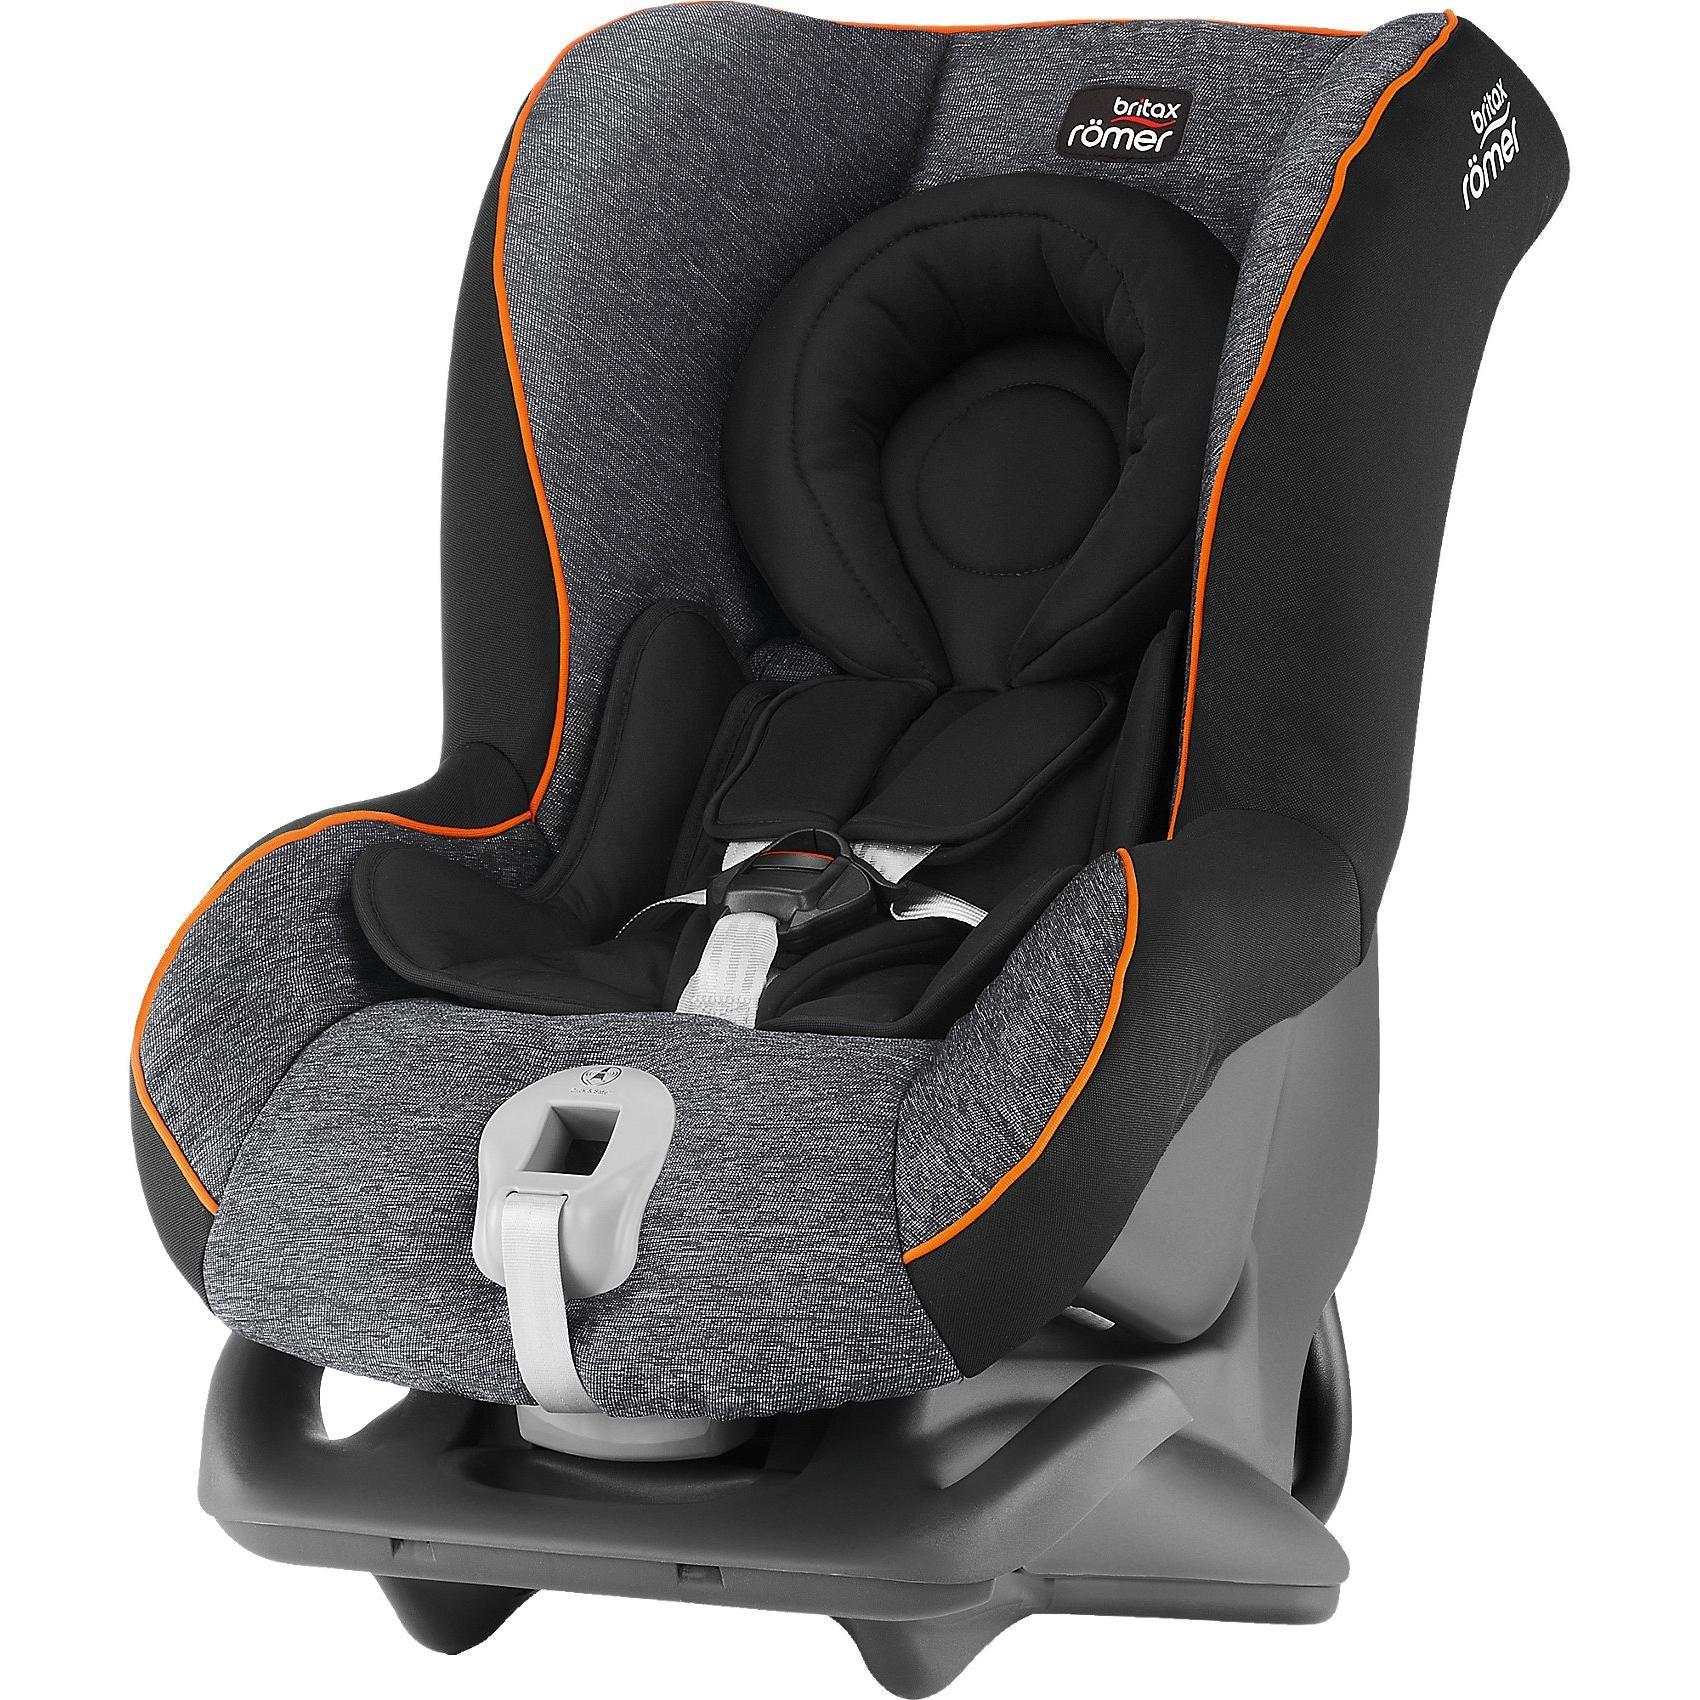 Britax Römer Auto-Kindersitz First Class Plus Black Marble 2018